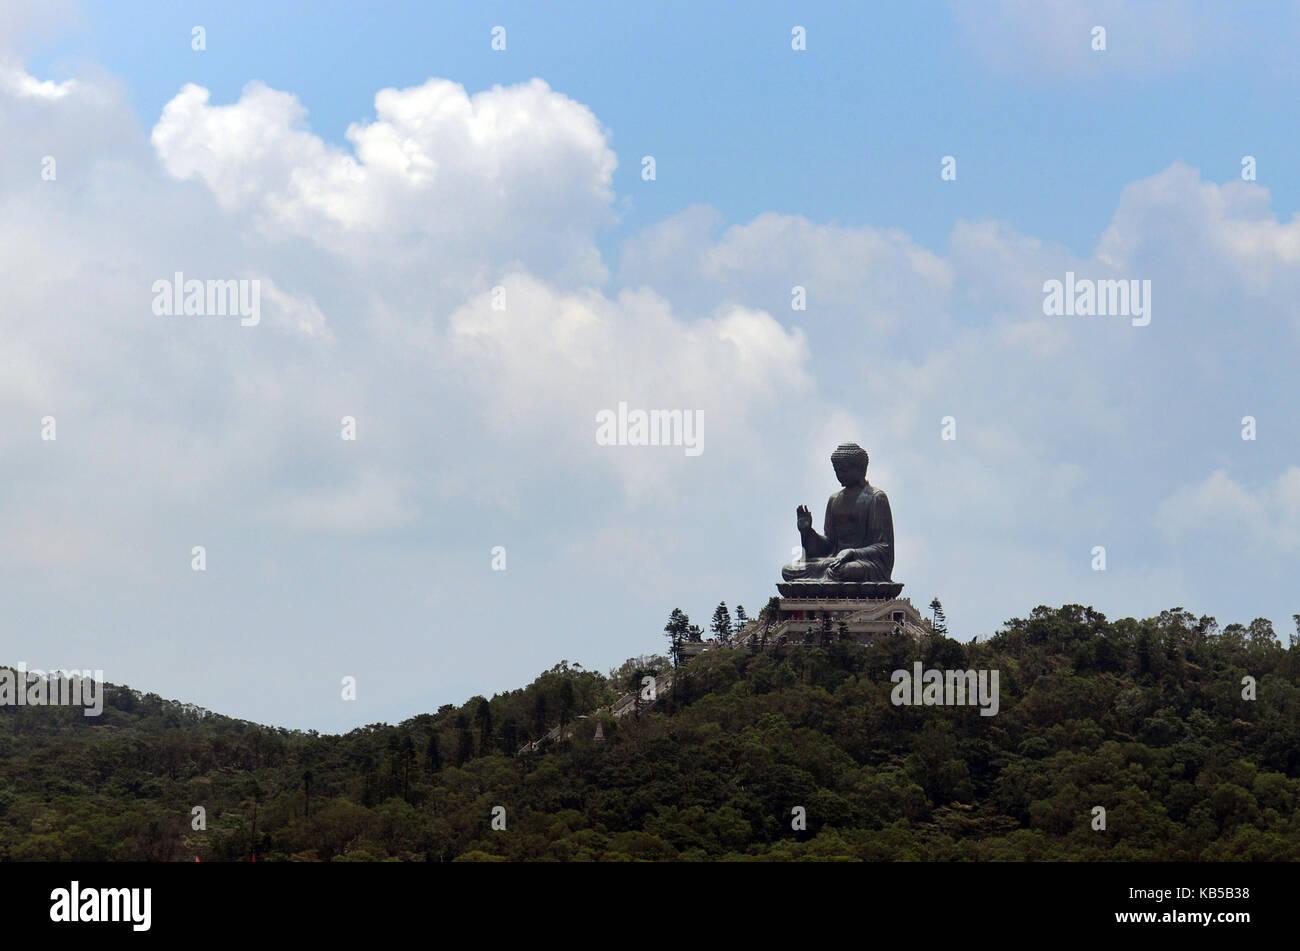 The Big Buddha in Lantau, Hong Kong. - Stock Image